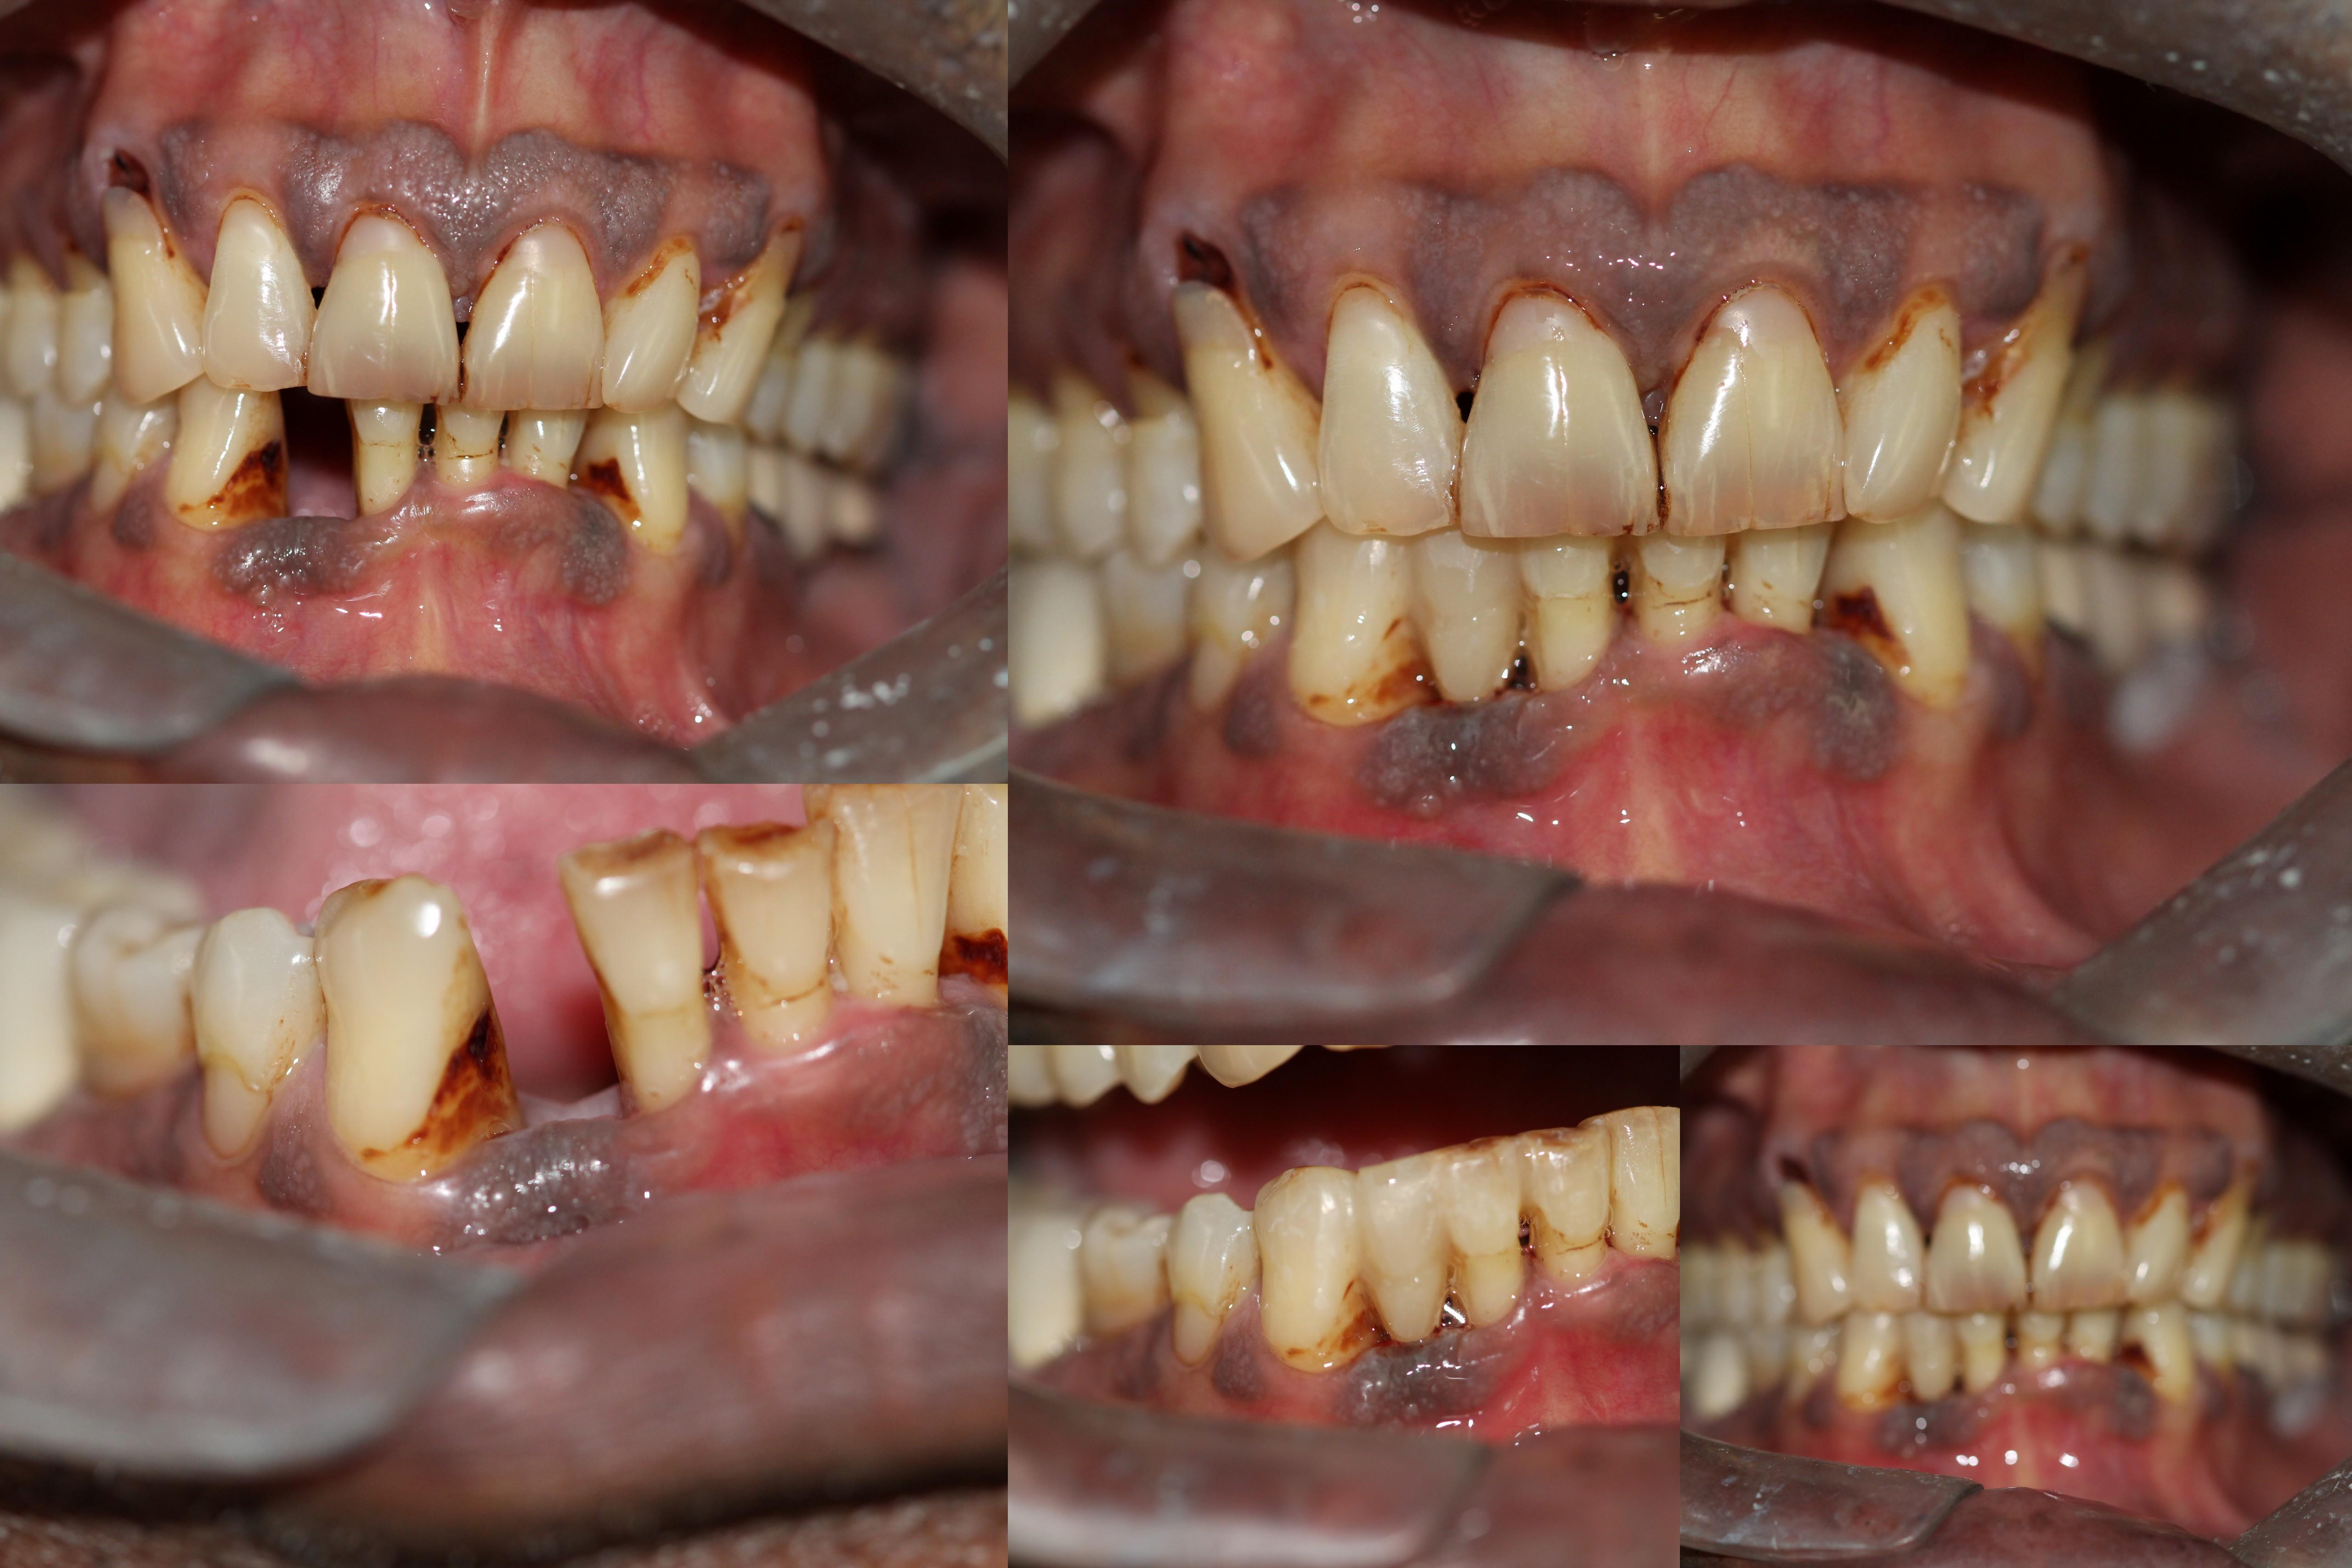 Bonded Bridge to replace lower anterior teeth Bhandari Dental Clinic Mukund Nagar,Pune